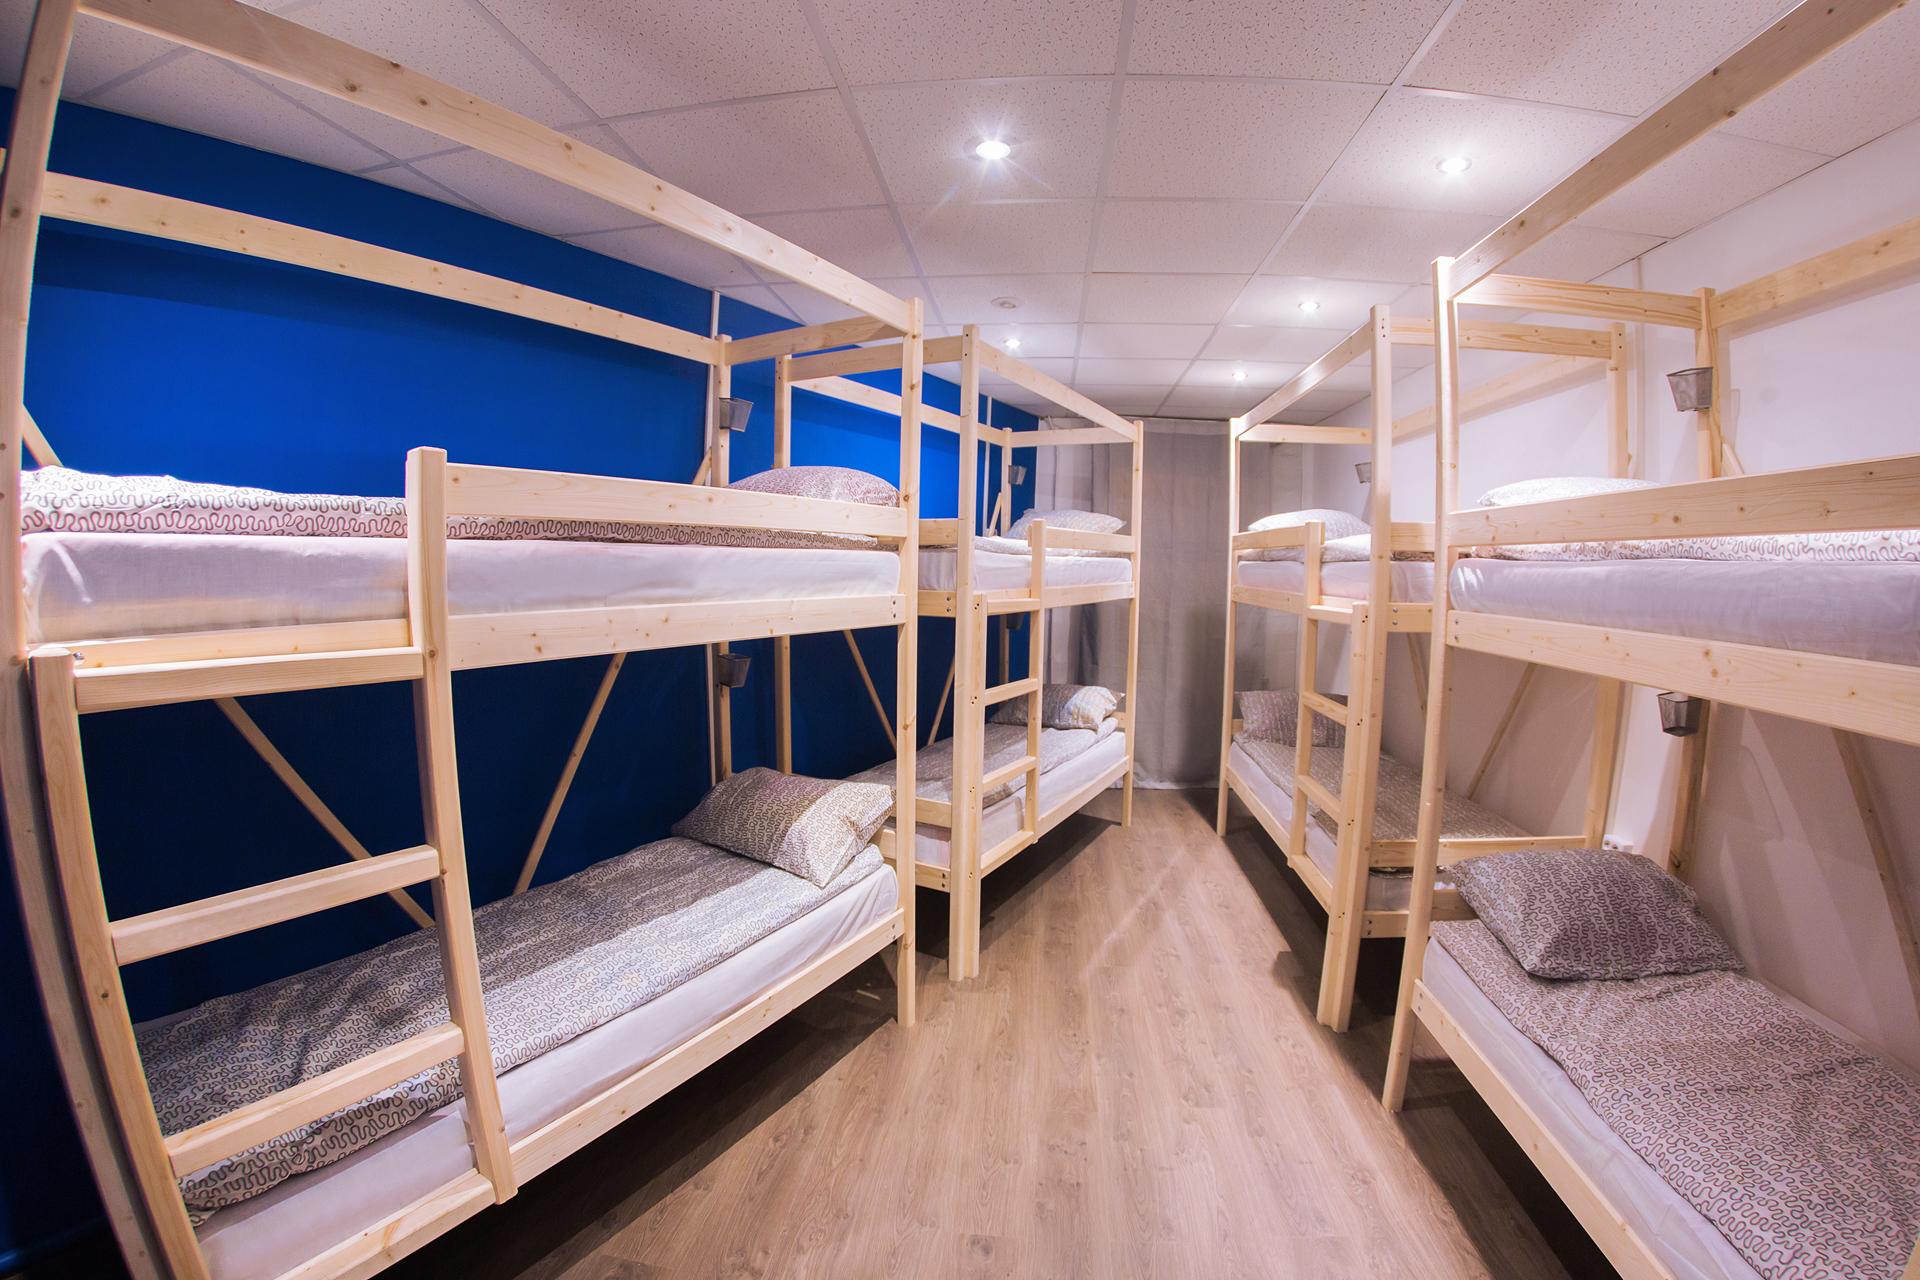 HOSTEL - Ula Hostel